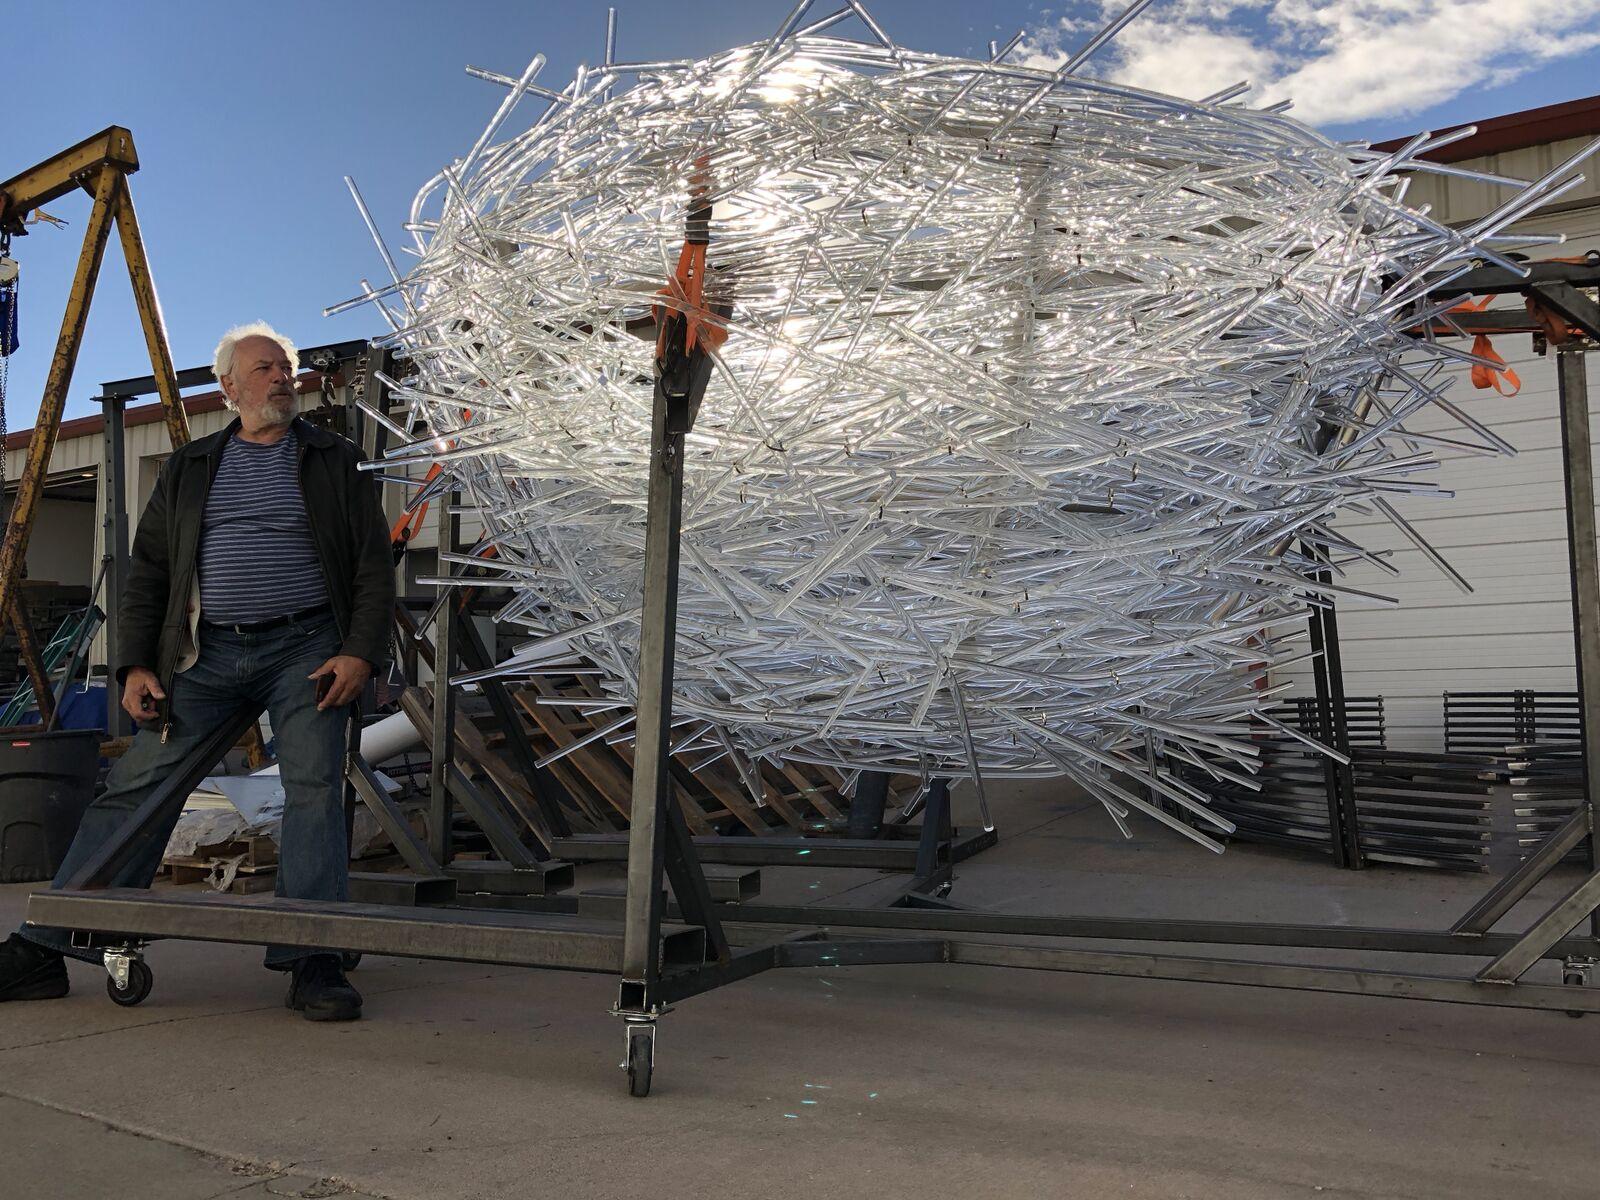 Calgary_The Nest_Donald Lipski_Public Art Services_J Grant Projects_22.jpeg